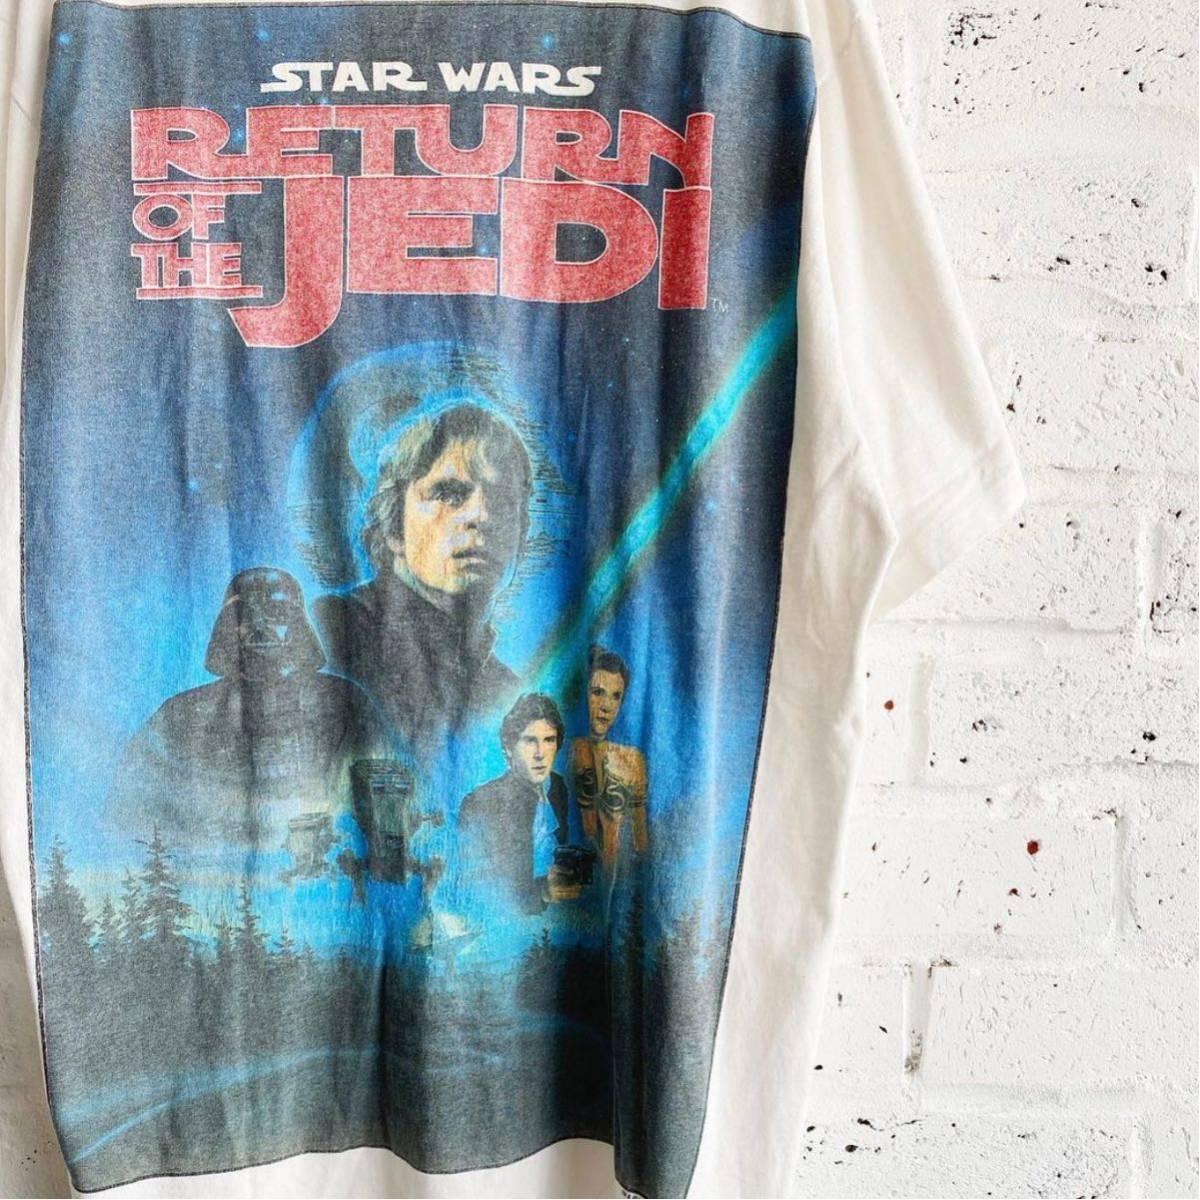 Star Wars Return of the JEDI Tシャツ ヴィンテージ Supreme vintage_画像2